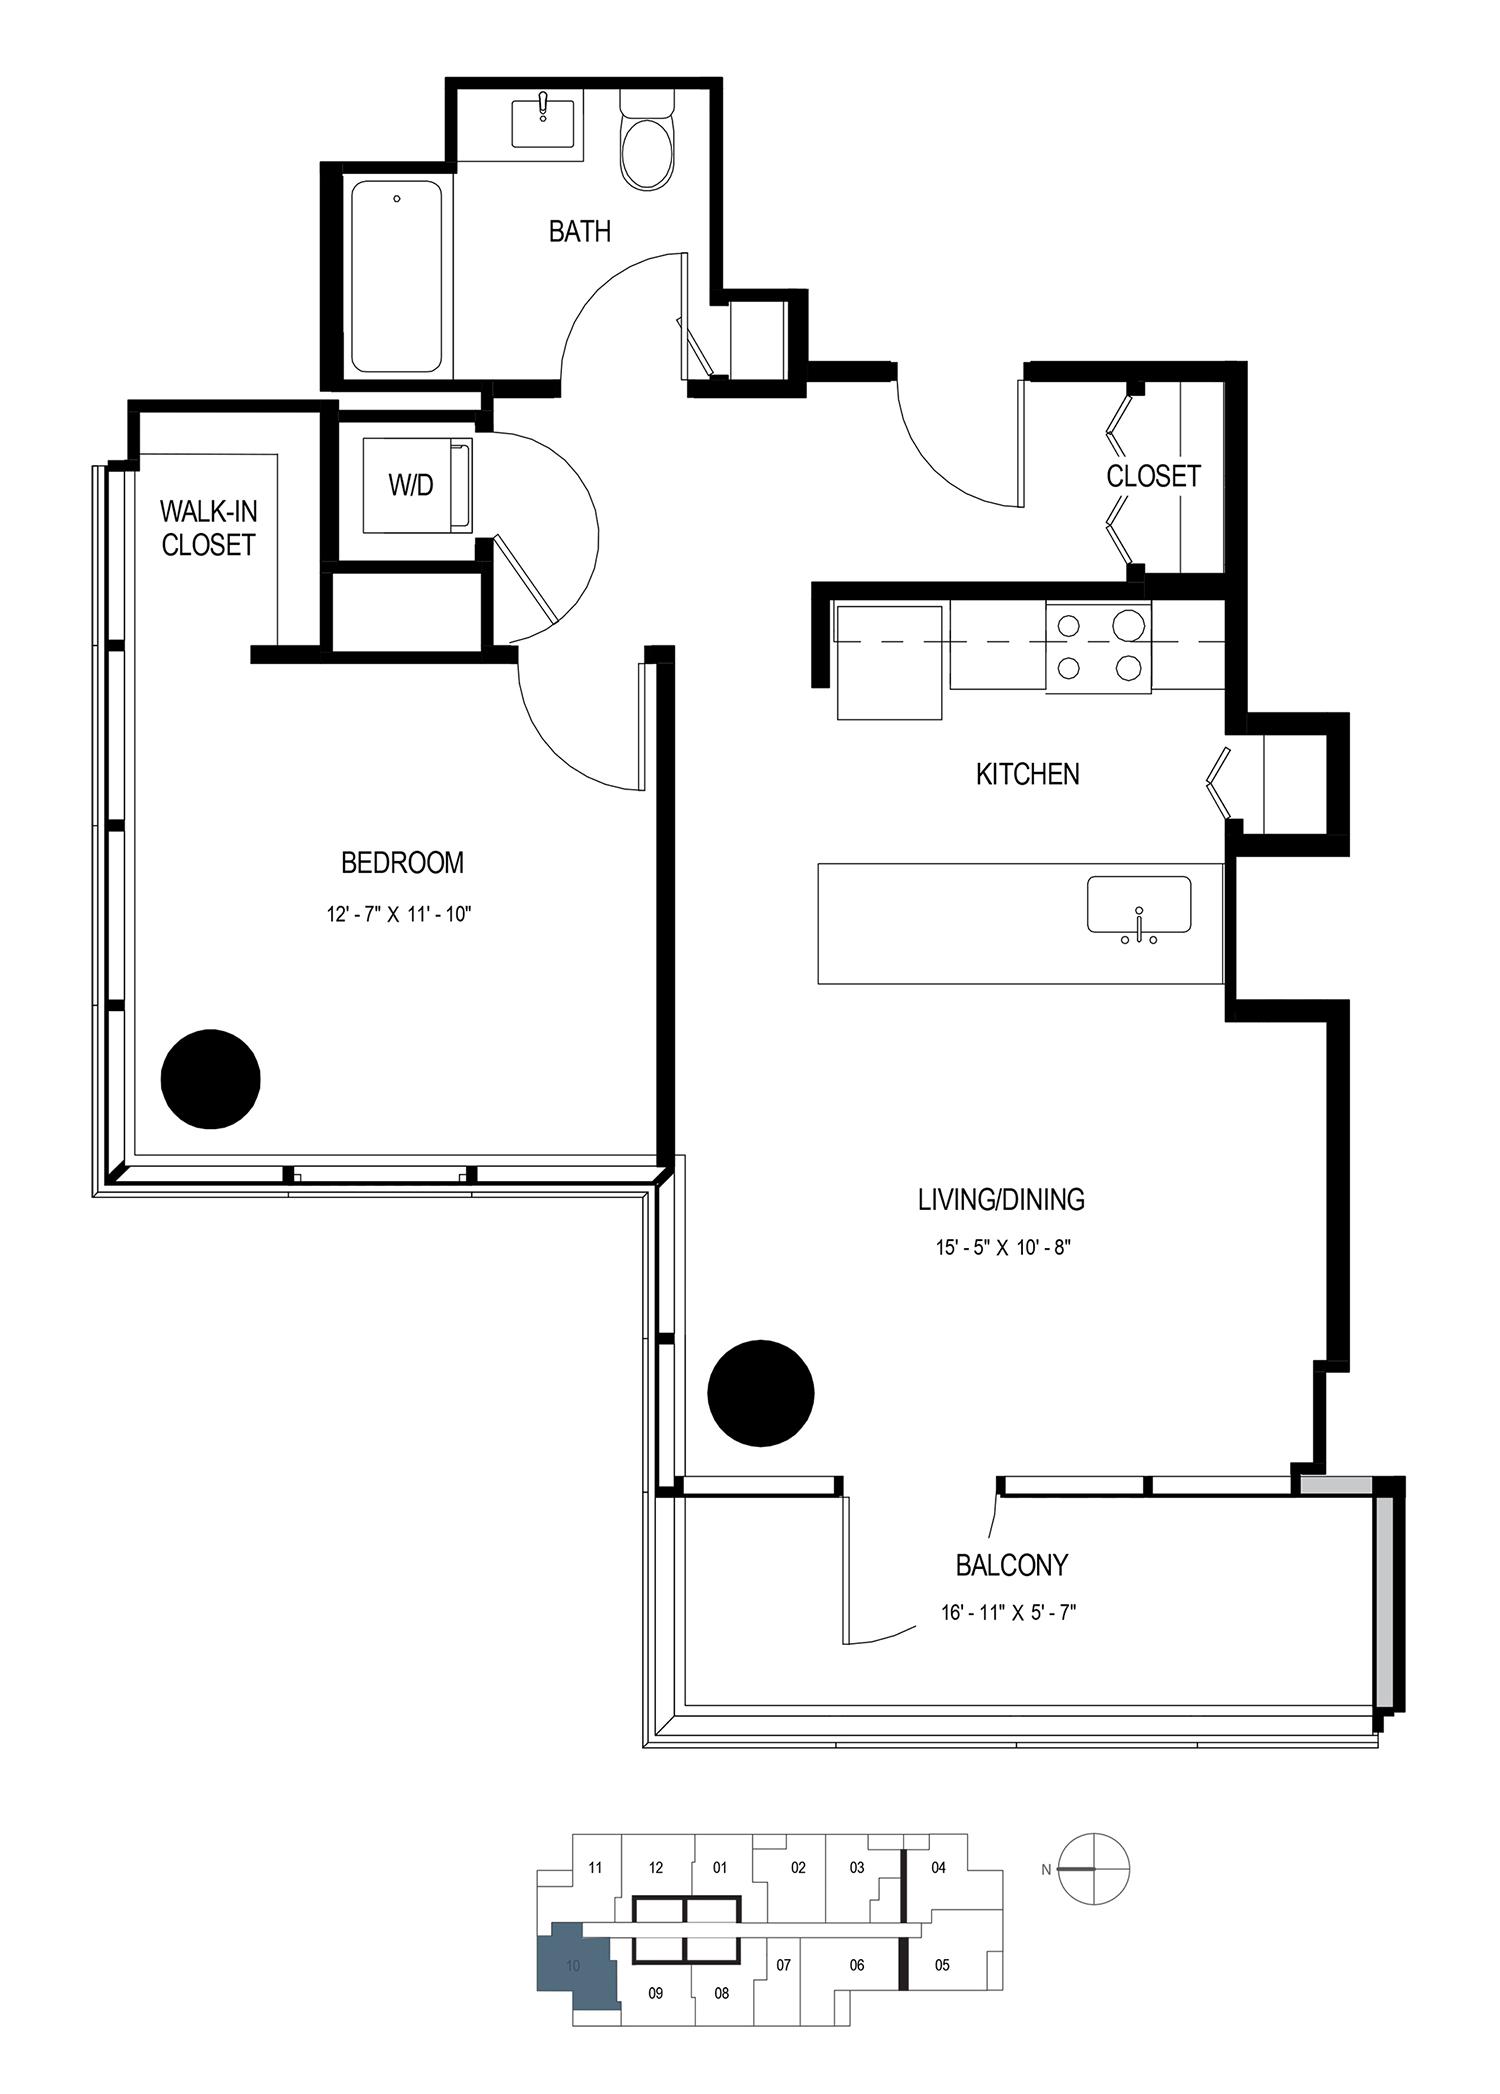 tags: #ge thru wall hvac units#ac heater wall unit#ge furnace wiring diagram #ac wall units with heat#wall ac units#ac thermostat wiring diagram#combo  heat